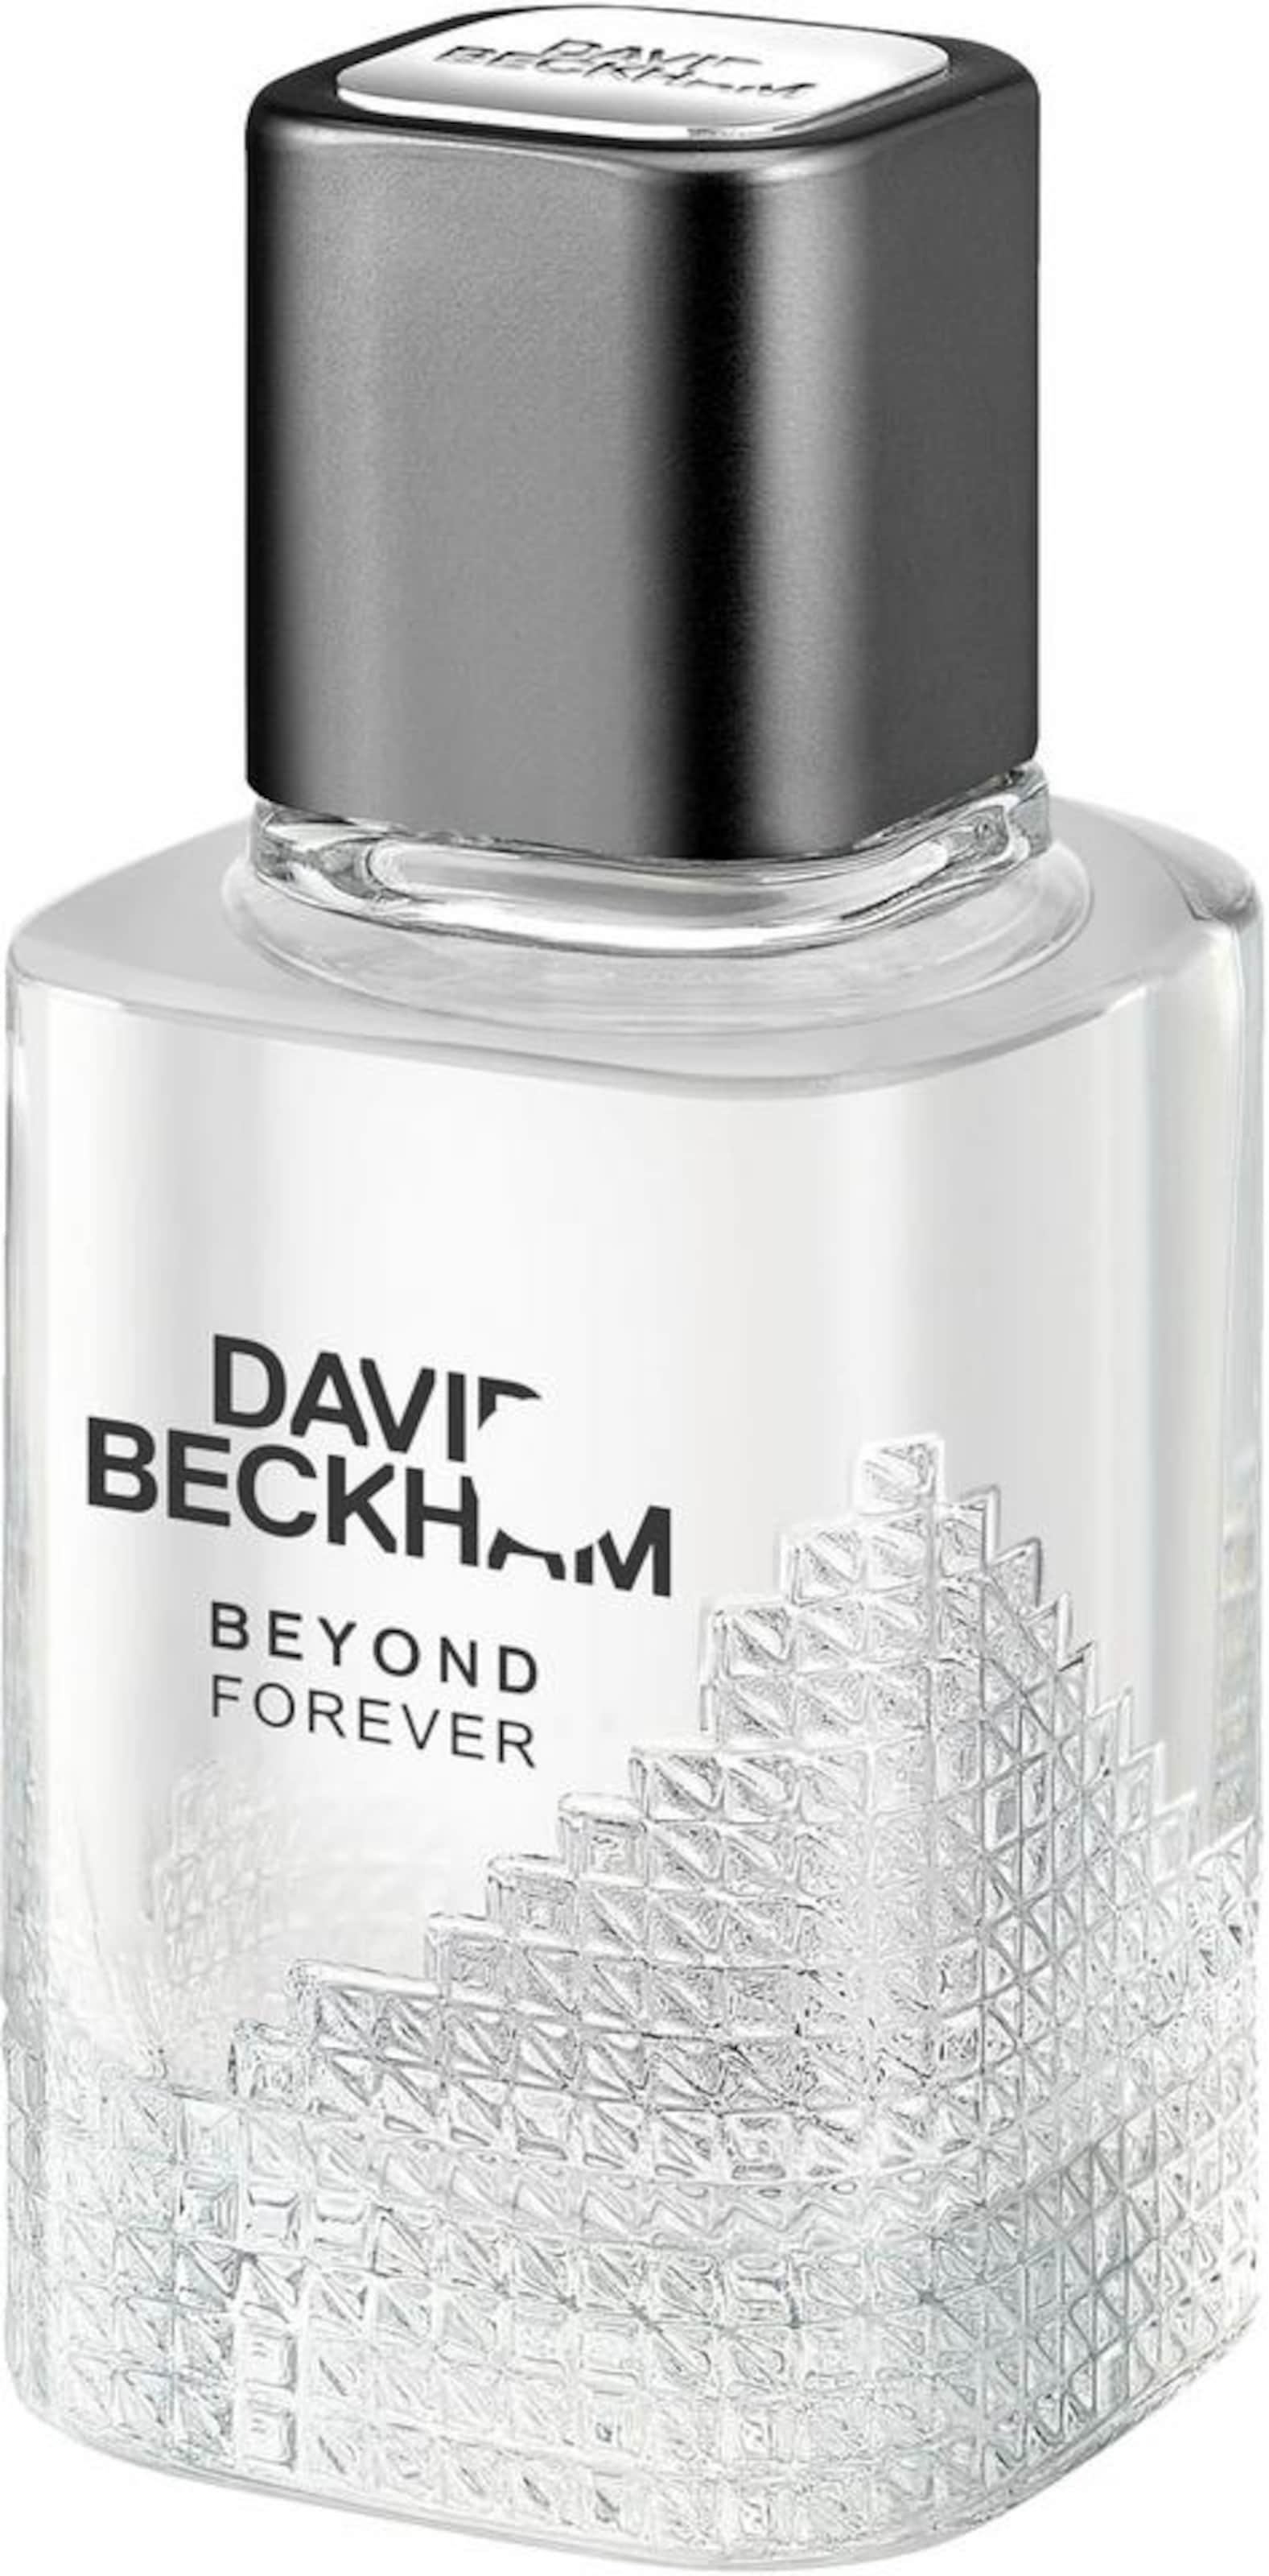 'beyond Toilette Beckham Forever' SchwarzSilber David Eau De In f6Ybg7yv